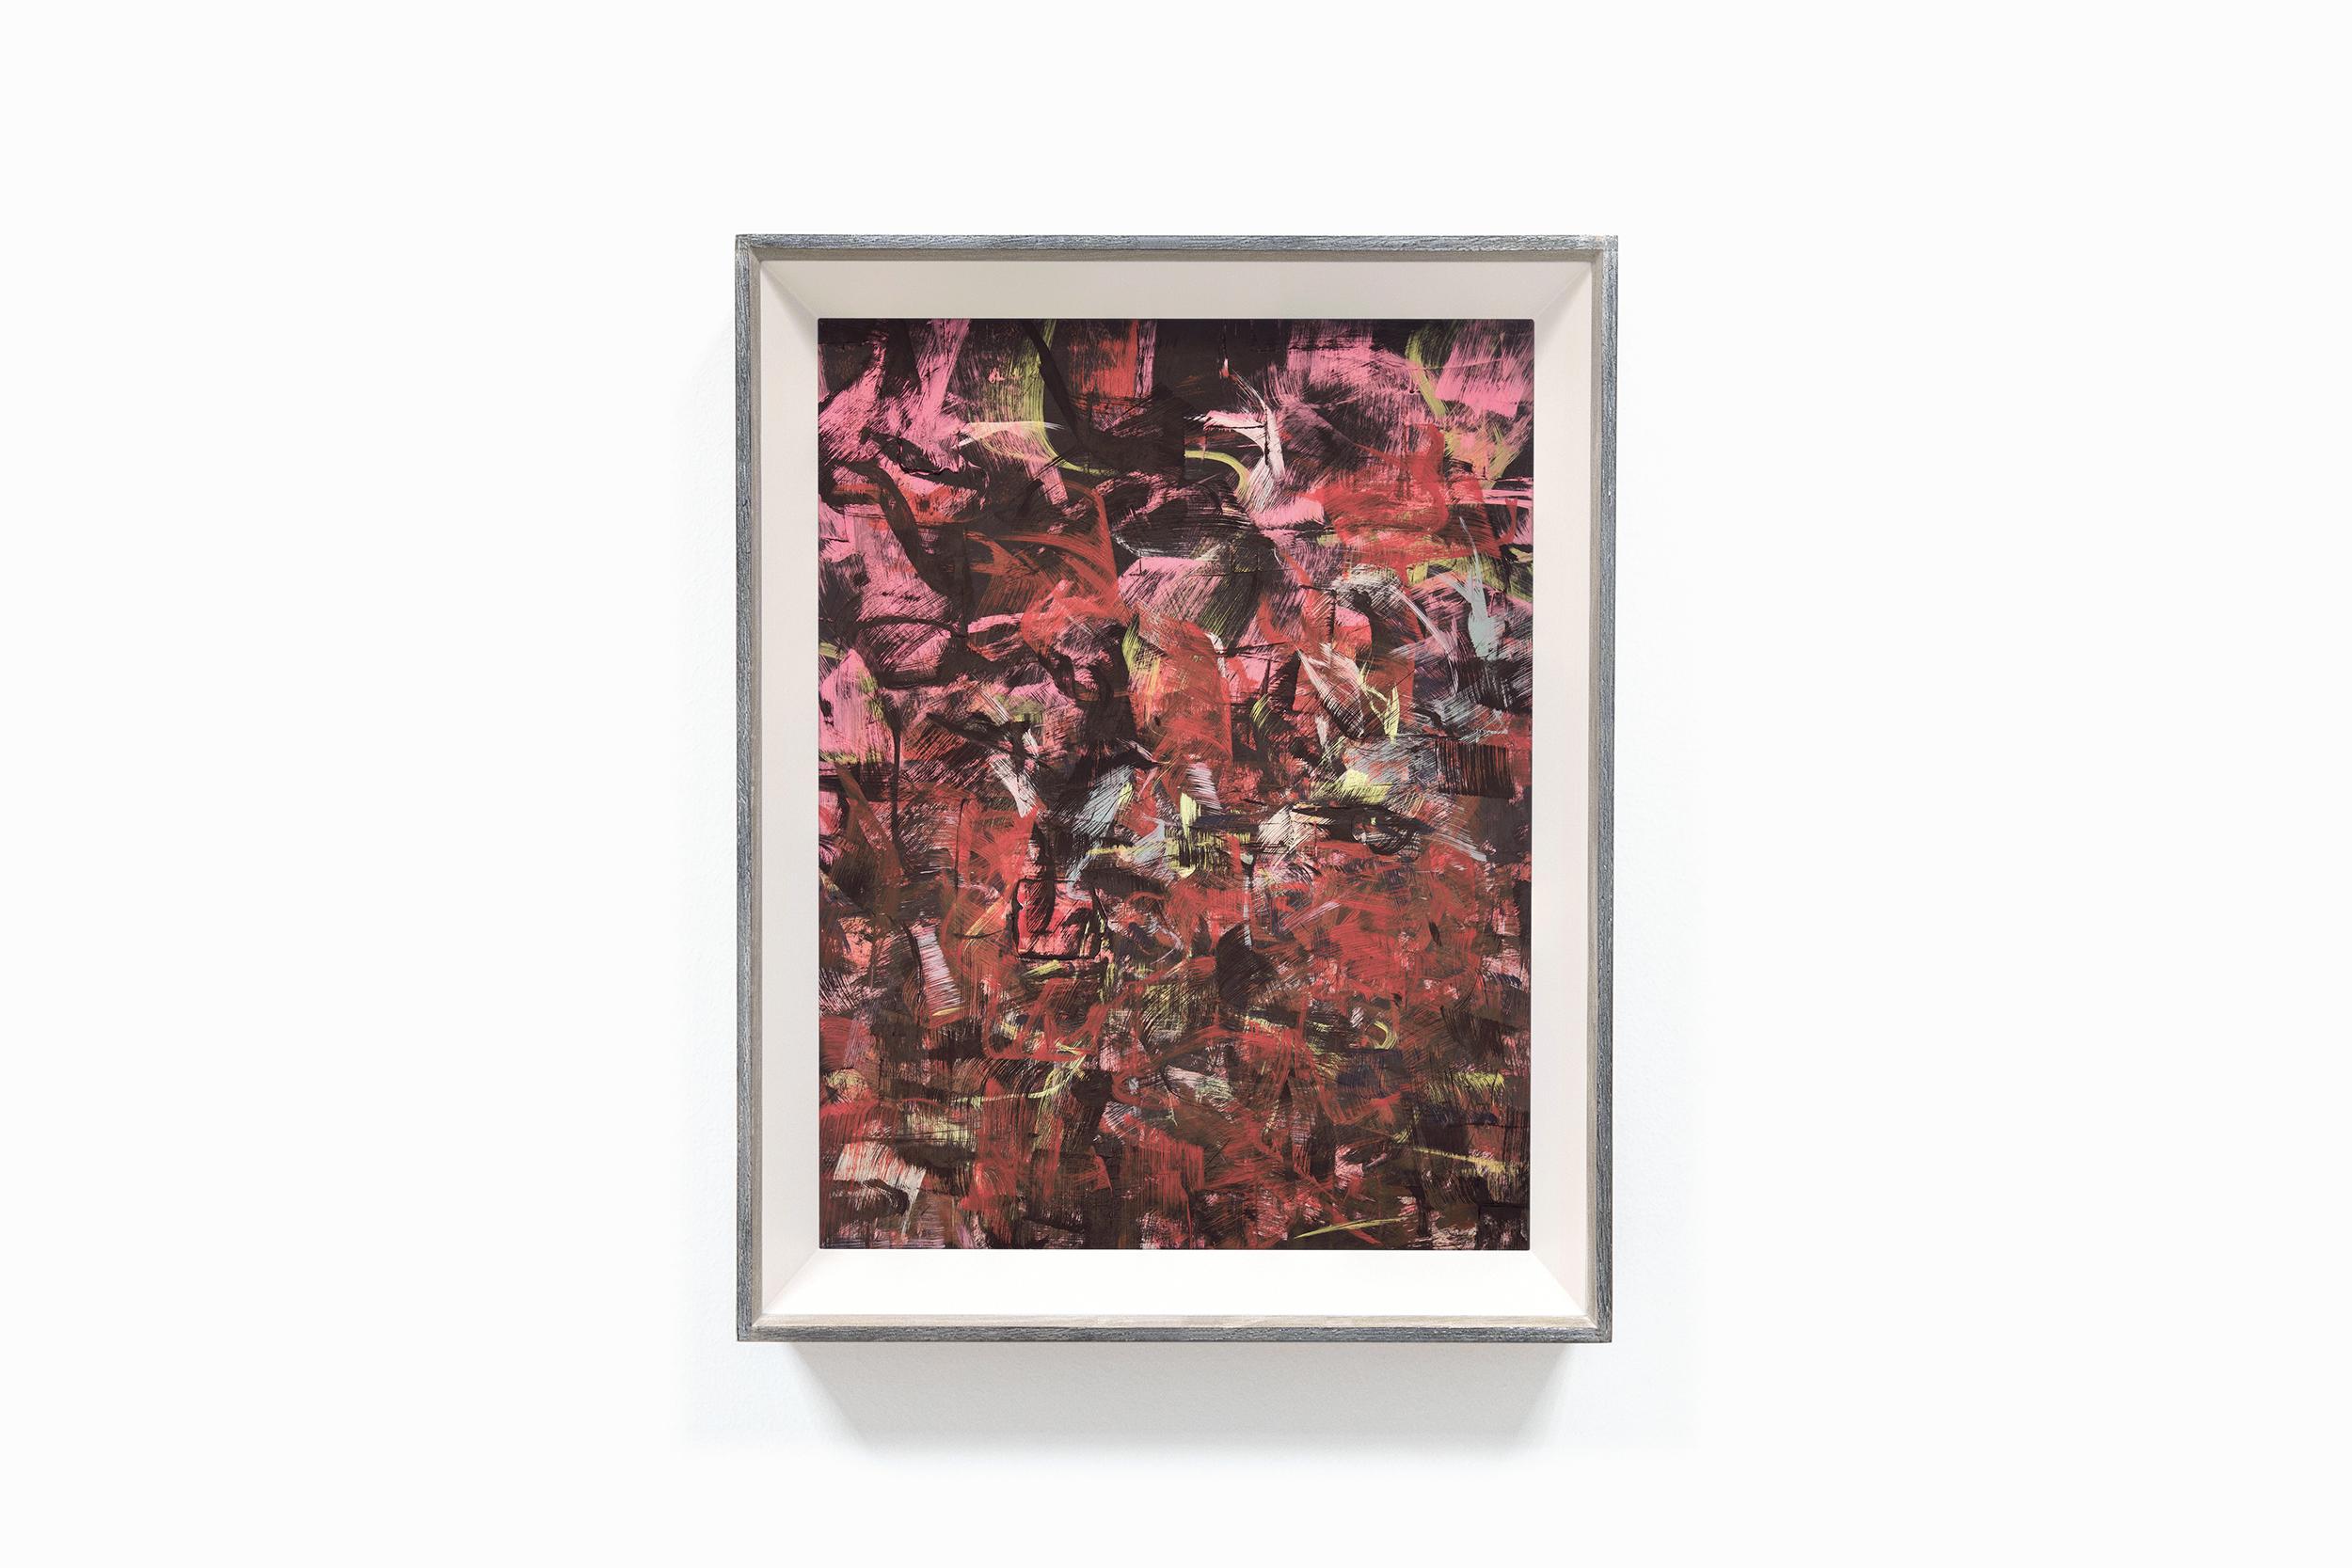 bonjourmolotov+Restless+Illustration+Ilustracao+painting+pintura+acrylic+acrílico+canvas+tela+paper+cardboard+mdf+Andre+Gigante+01BN6.jpg